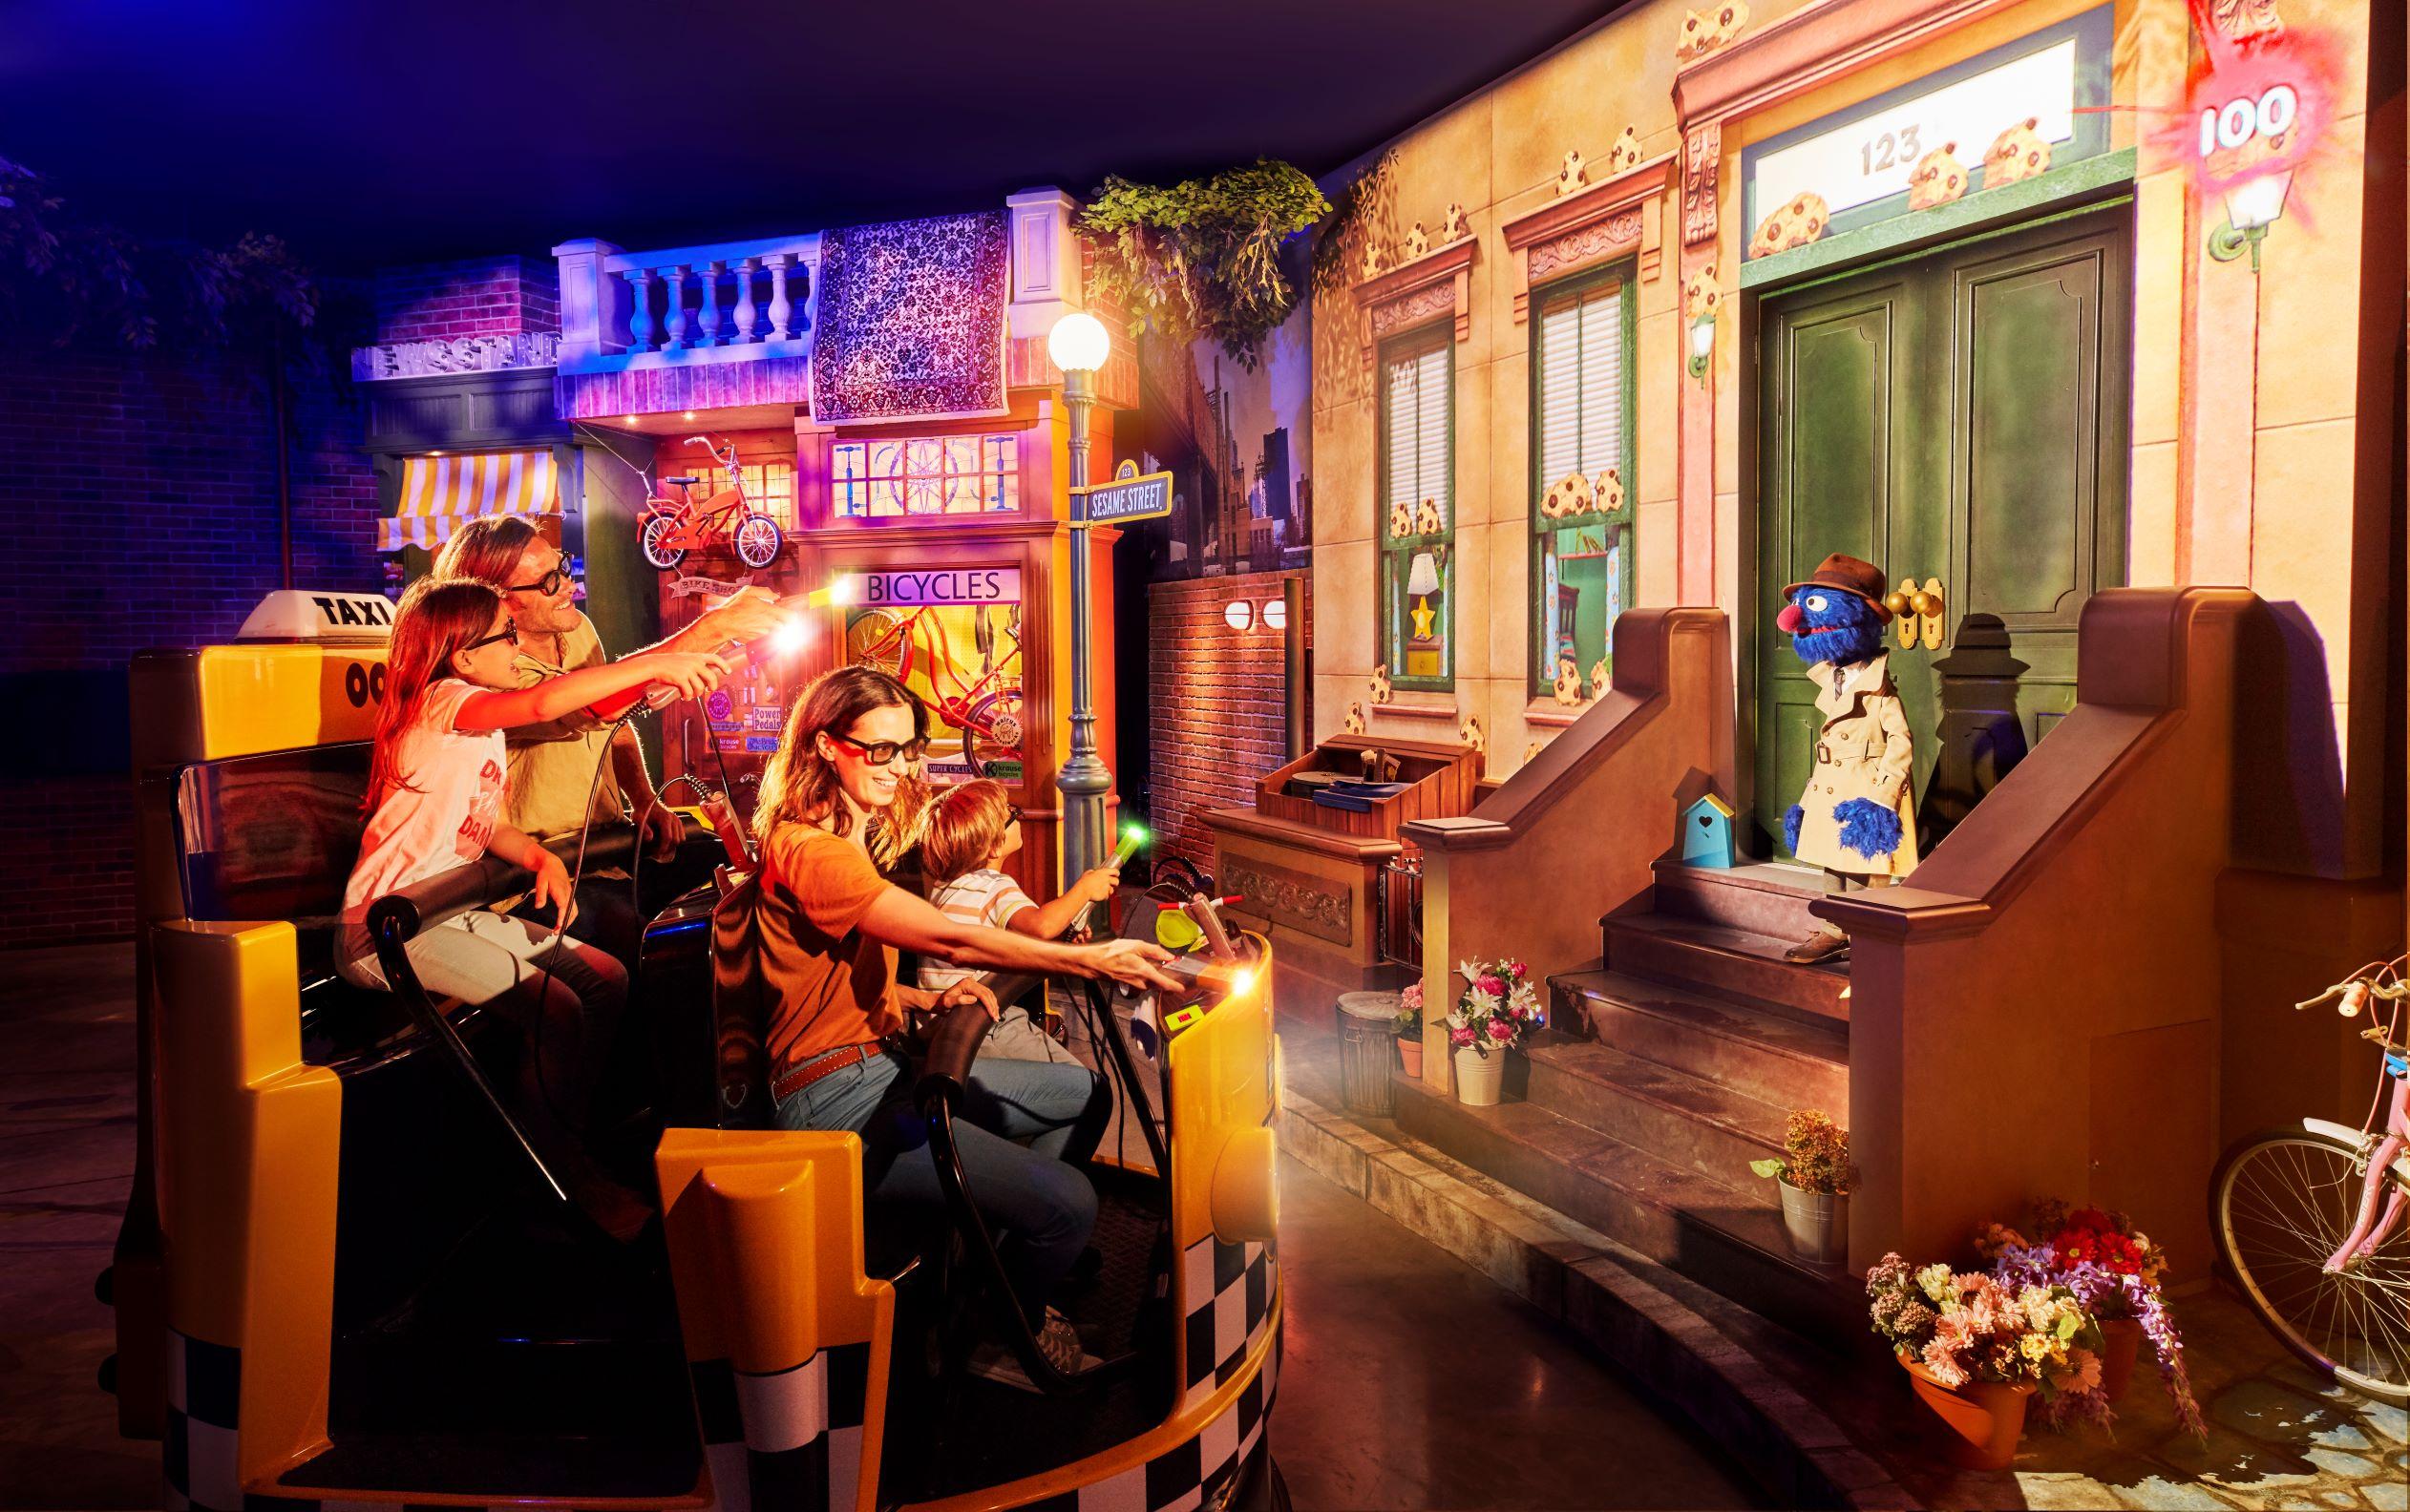 Sesame Street Street Mission Ride